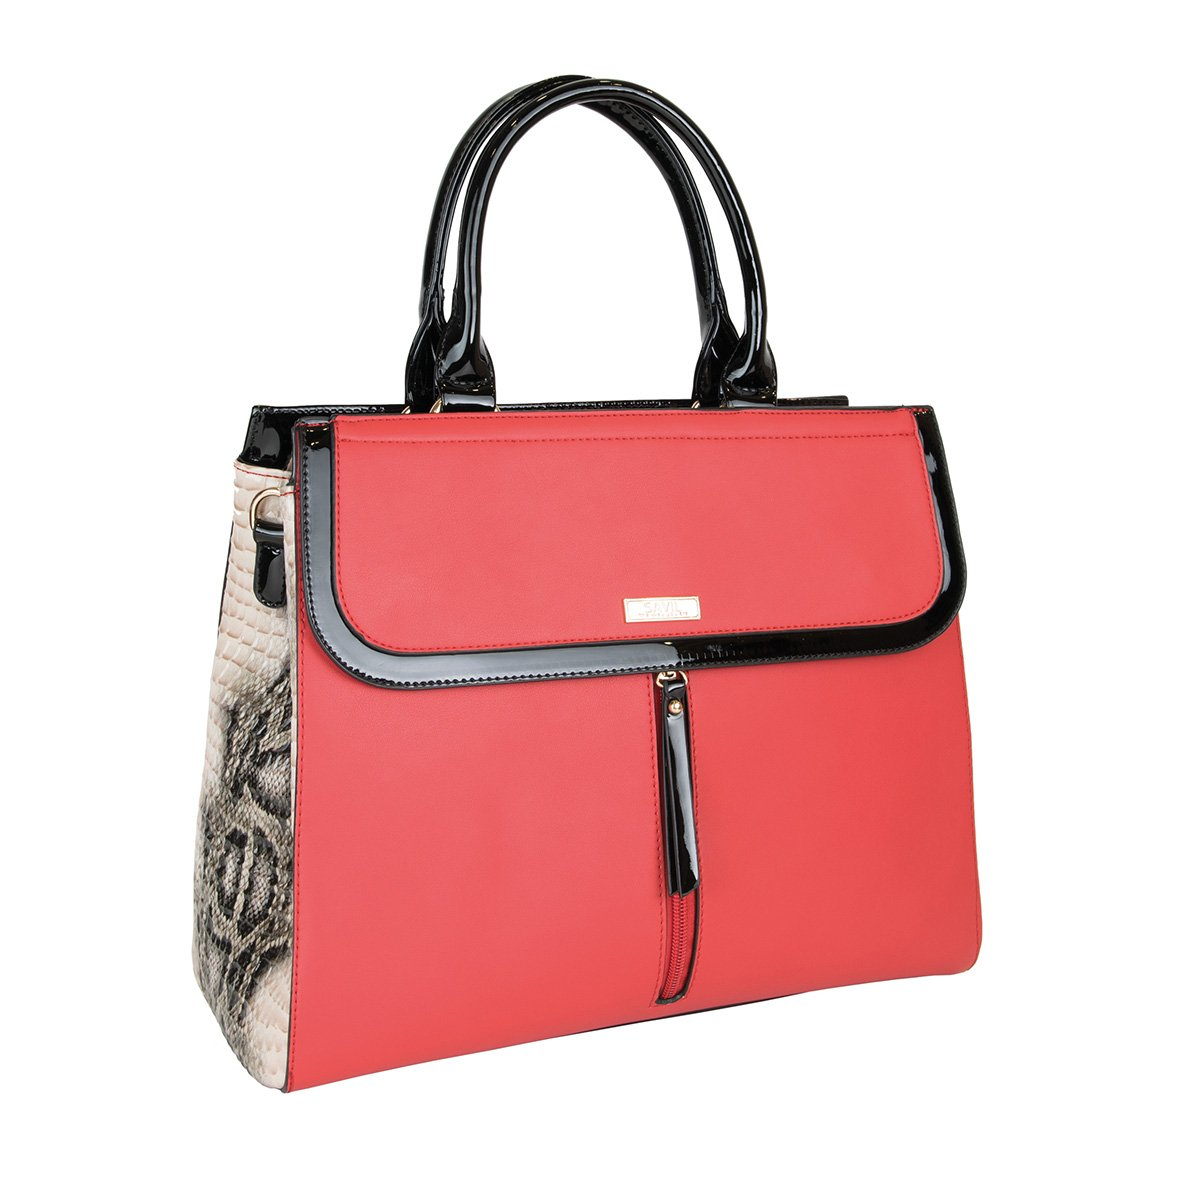 Bagsin-Savil-18-25-23-Red-A1